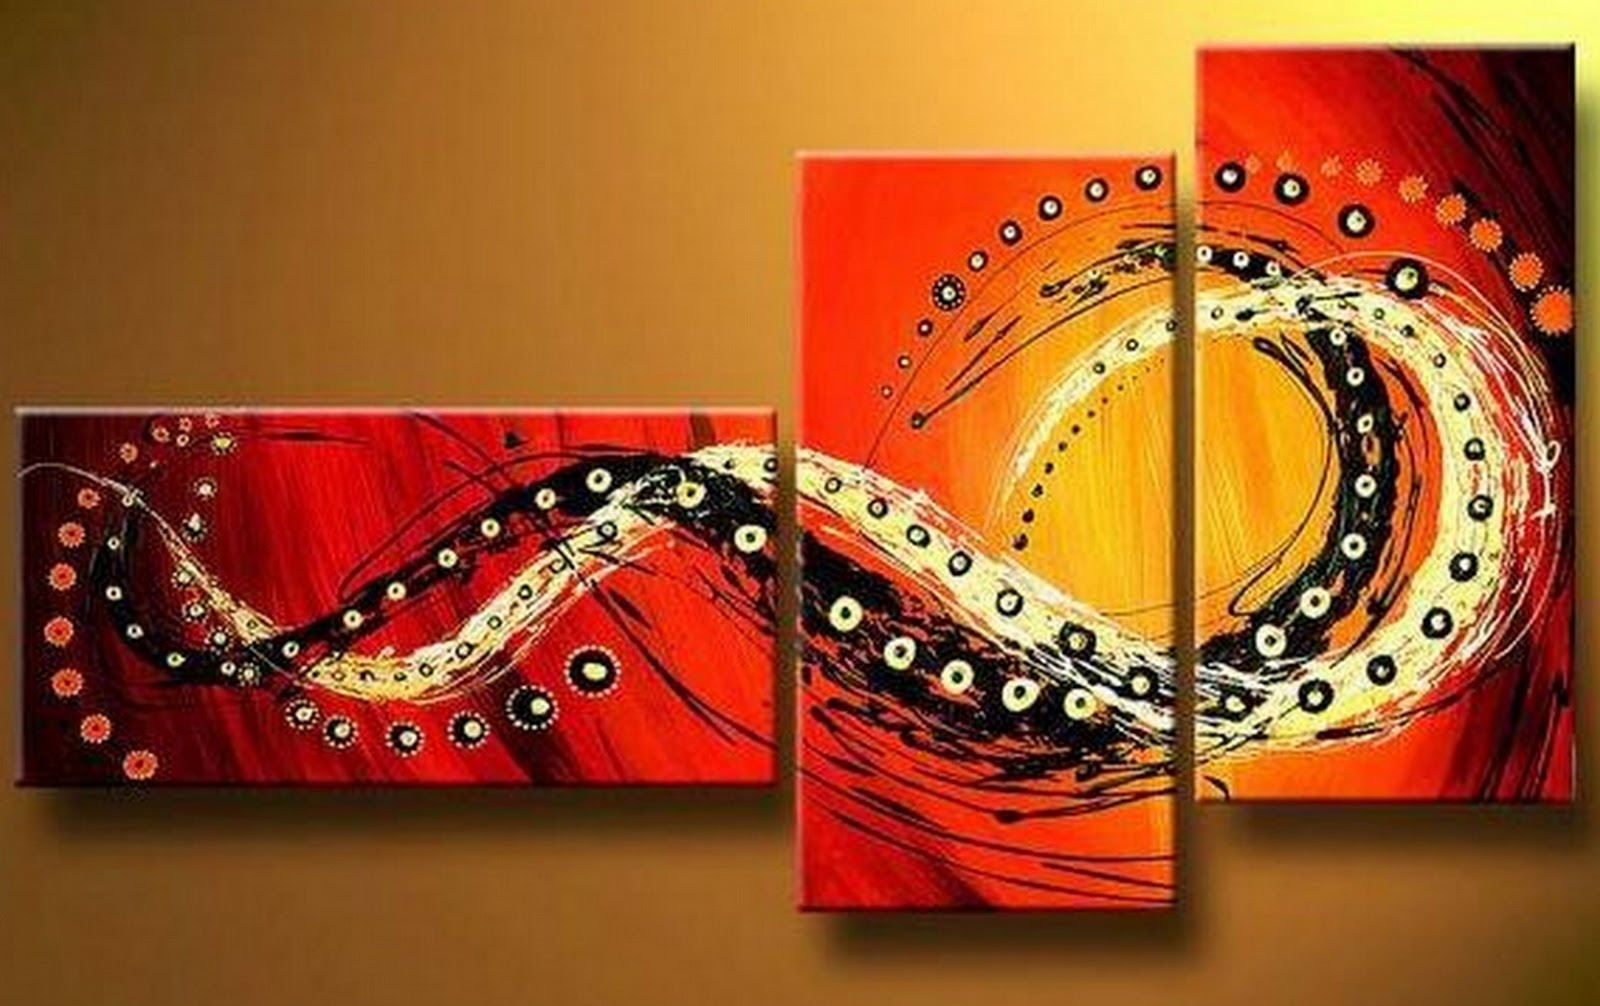 Cuadros pinturas oleos cuadros modernos abstractos - Triptico cuadros modernos ...